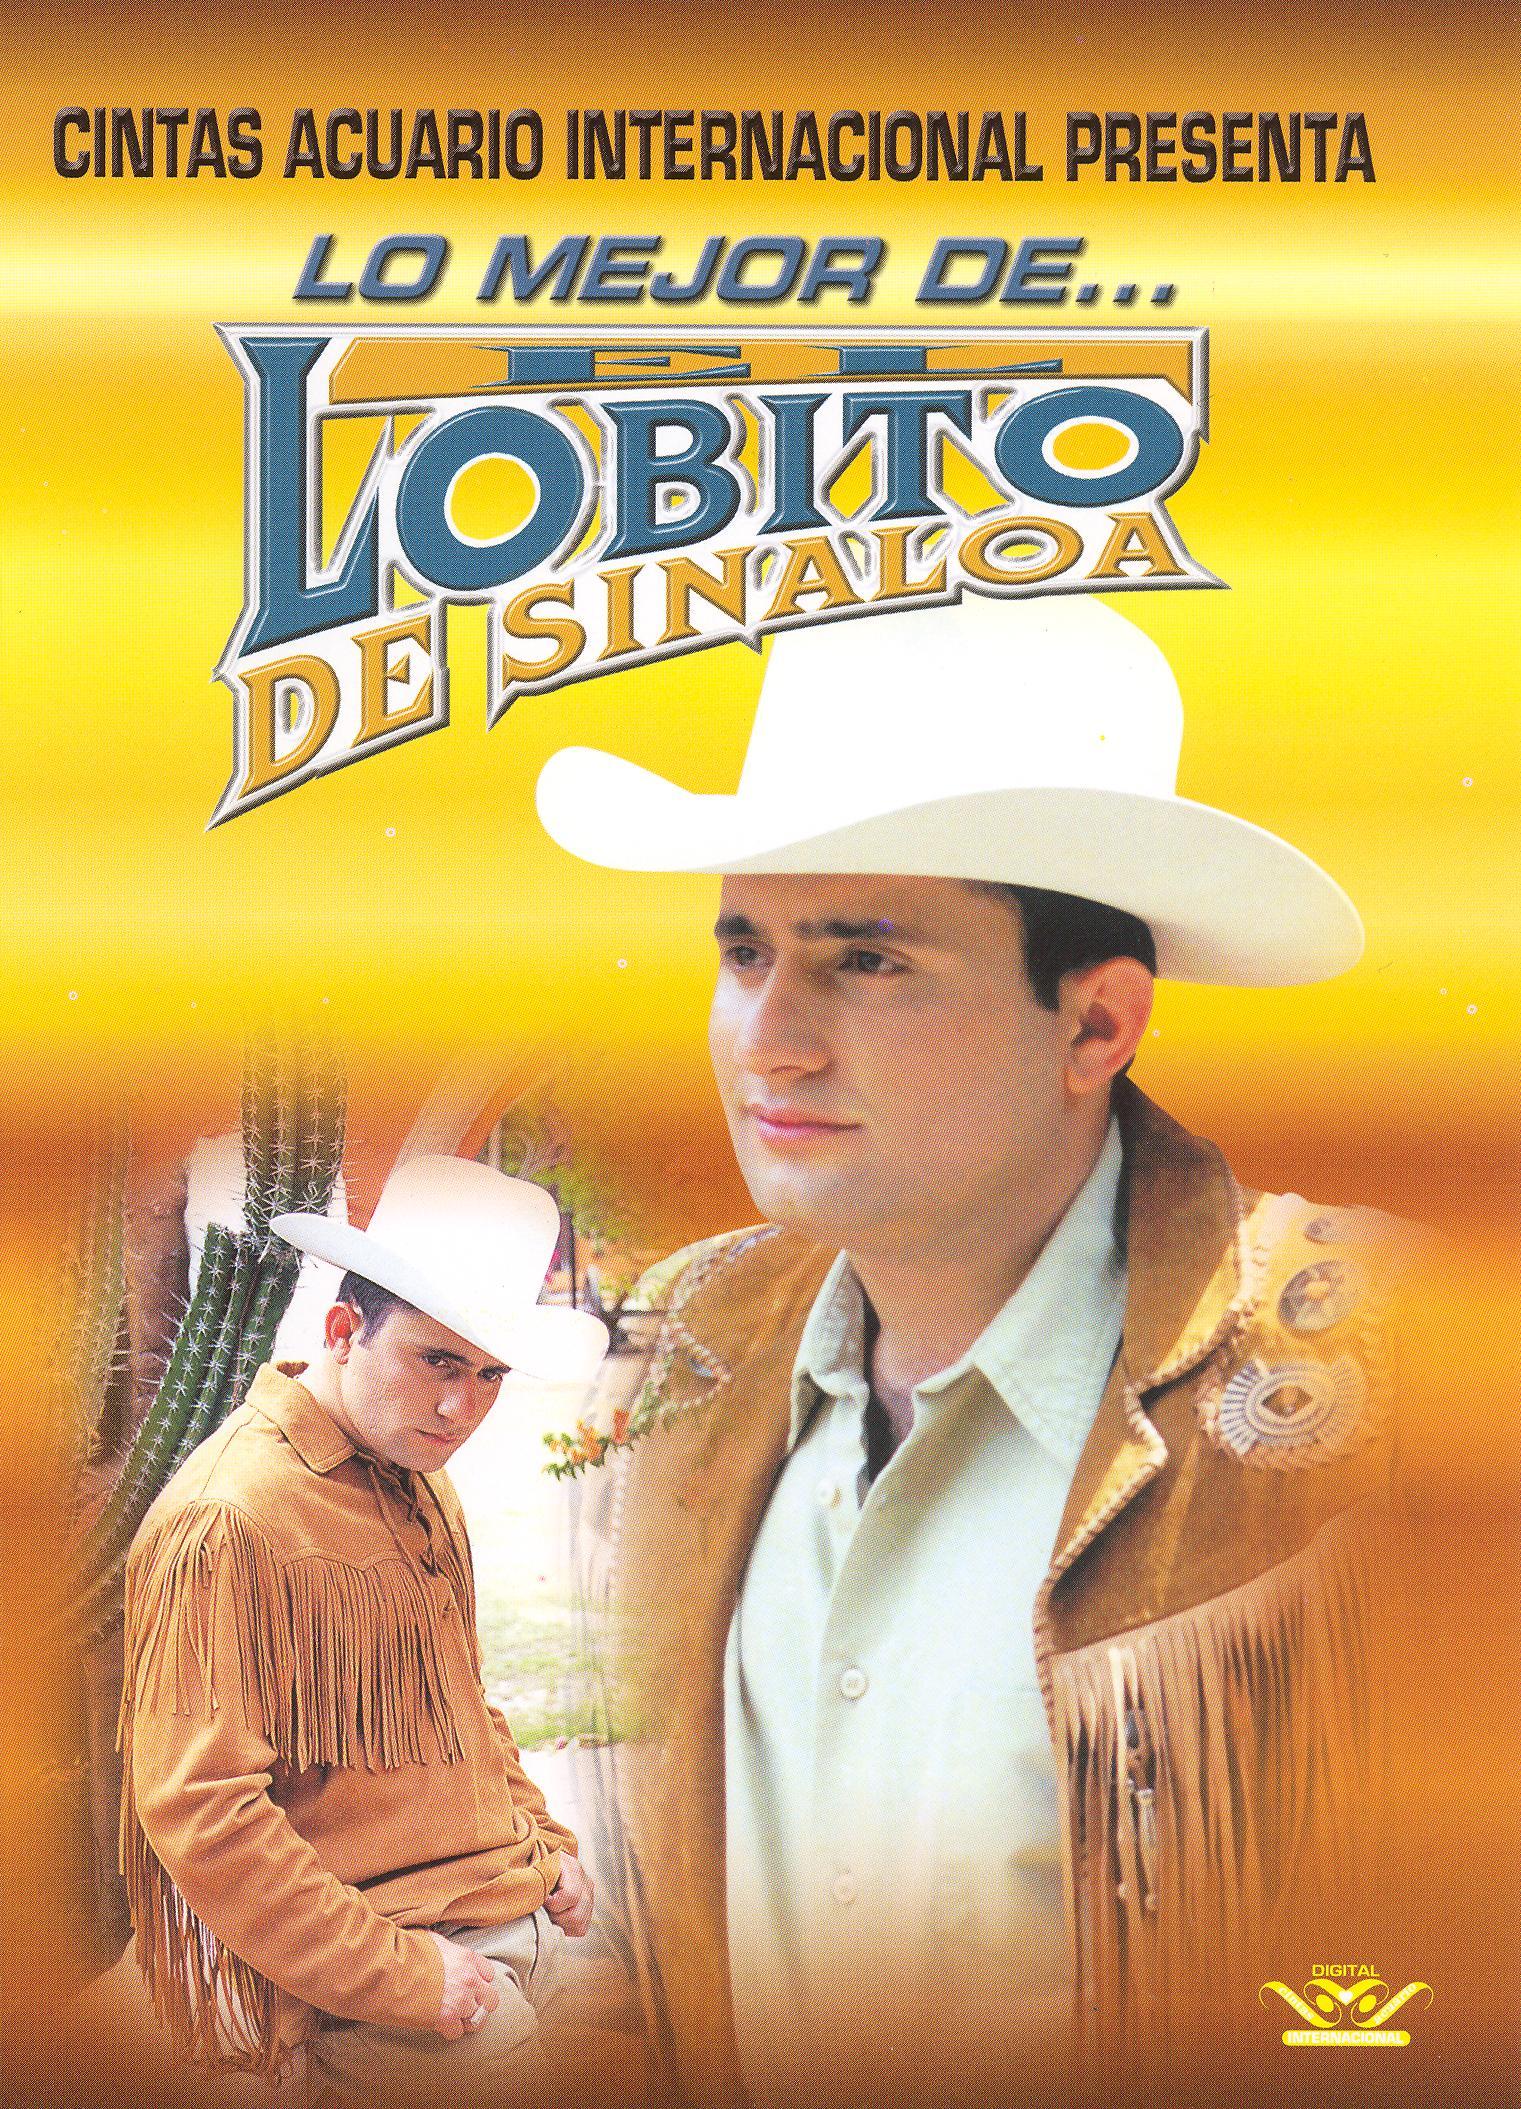 Lobito de Sinaloa: Lo Mejor de Lobito de Sinaloa